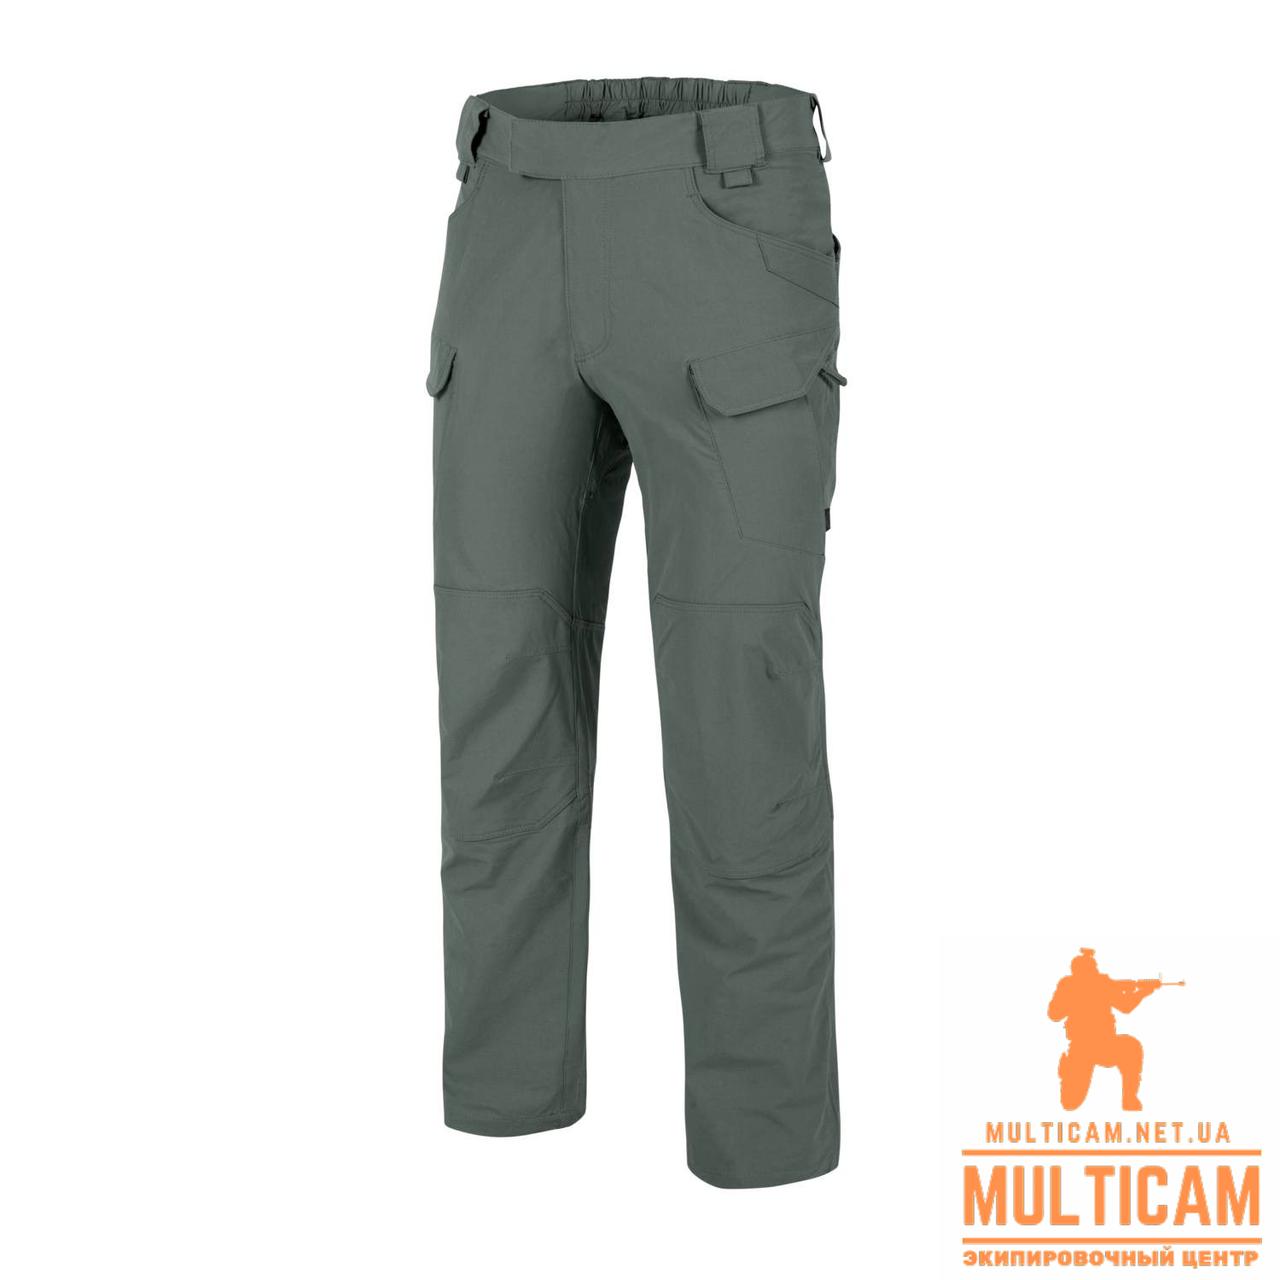 Брюки Helikon-Tex® OTP (Outdoor Pants)® - VersaStretch® - Olive Drab